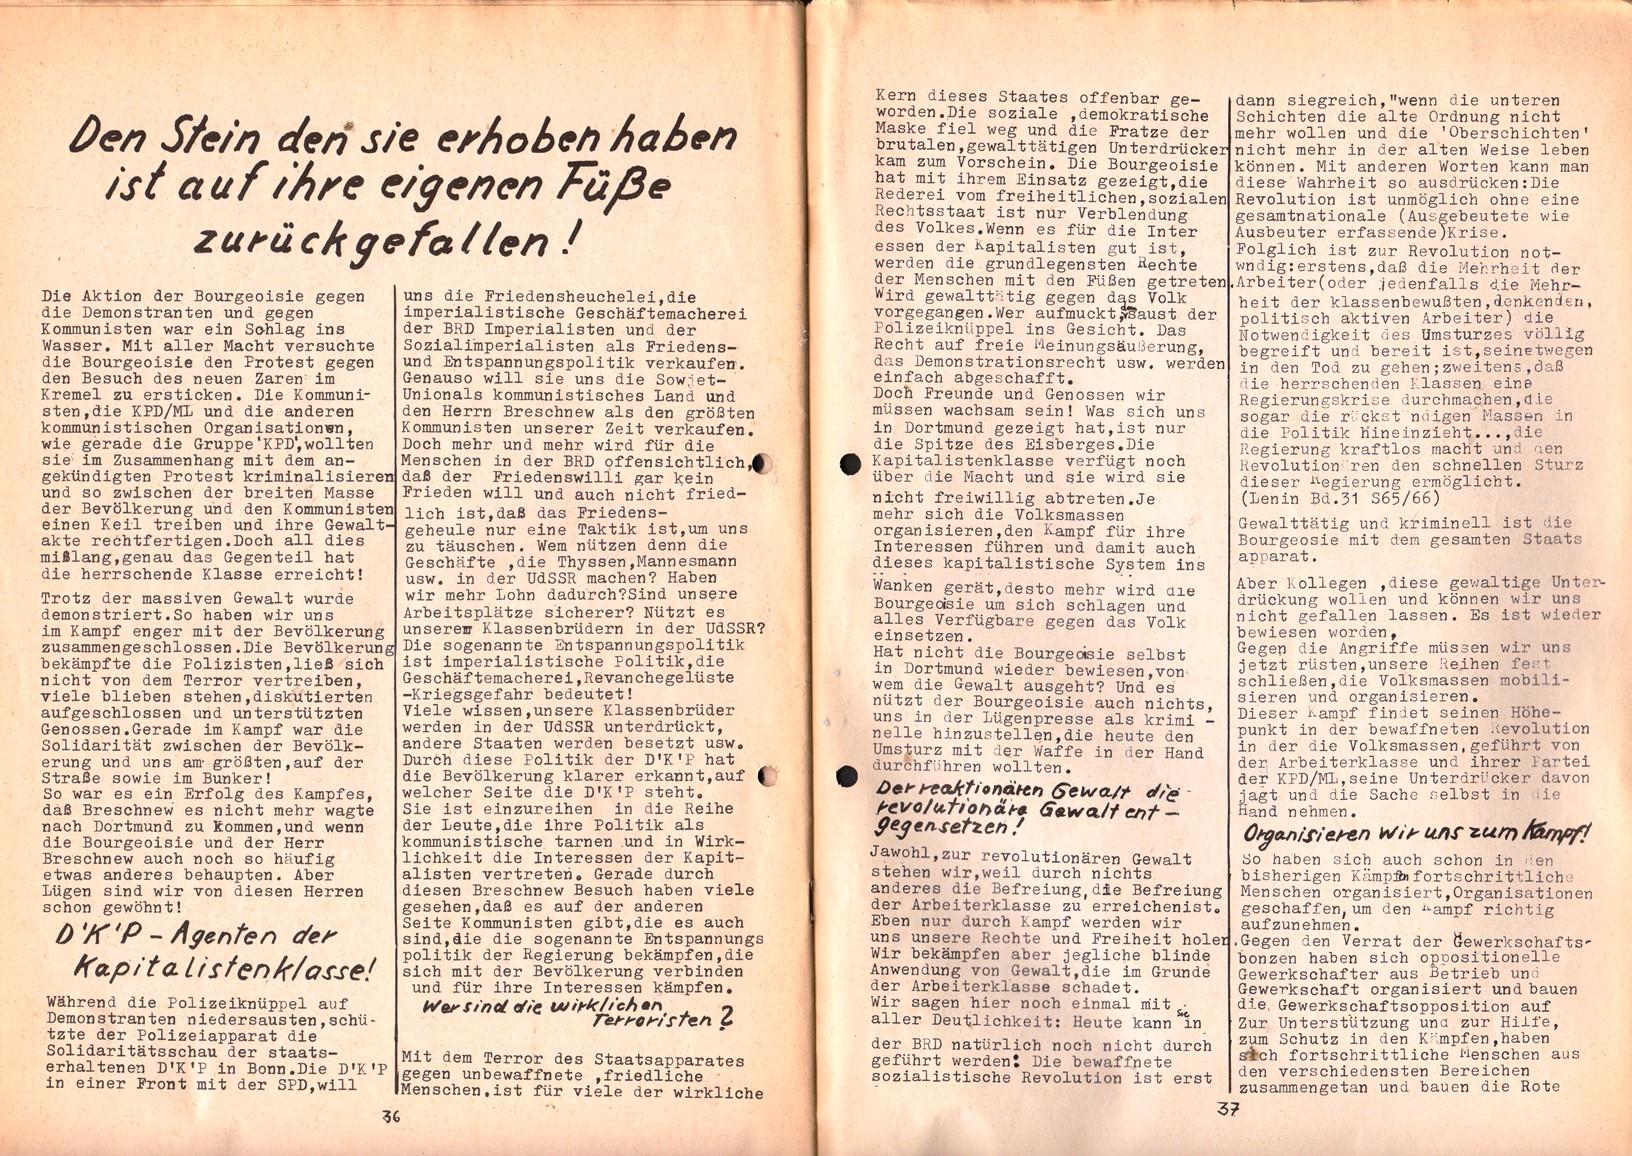 KPDML_1973_Breschnew_Besuch_in_Bonn_19